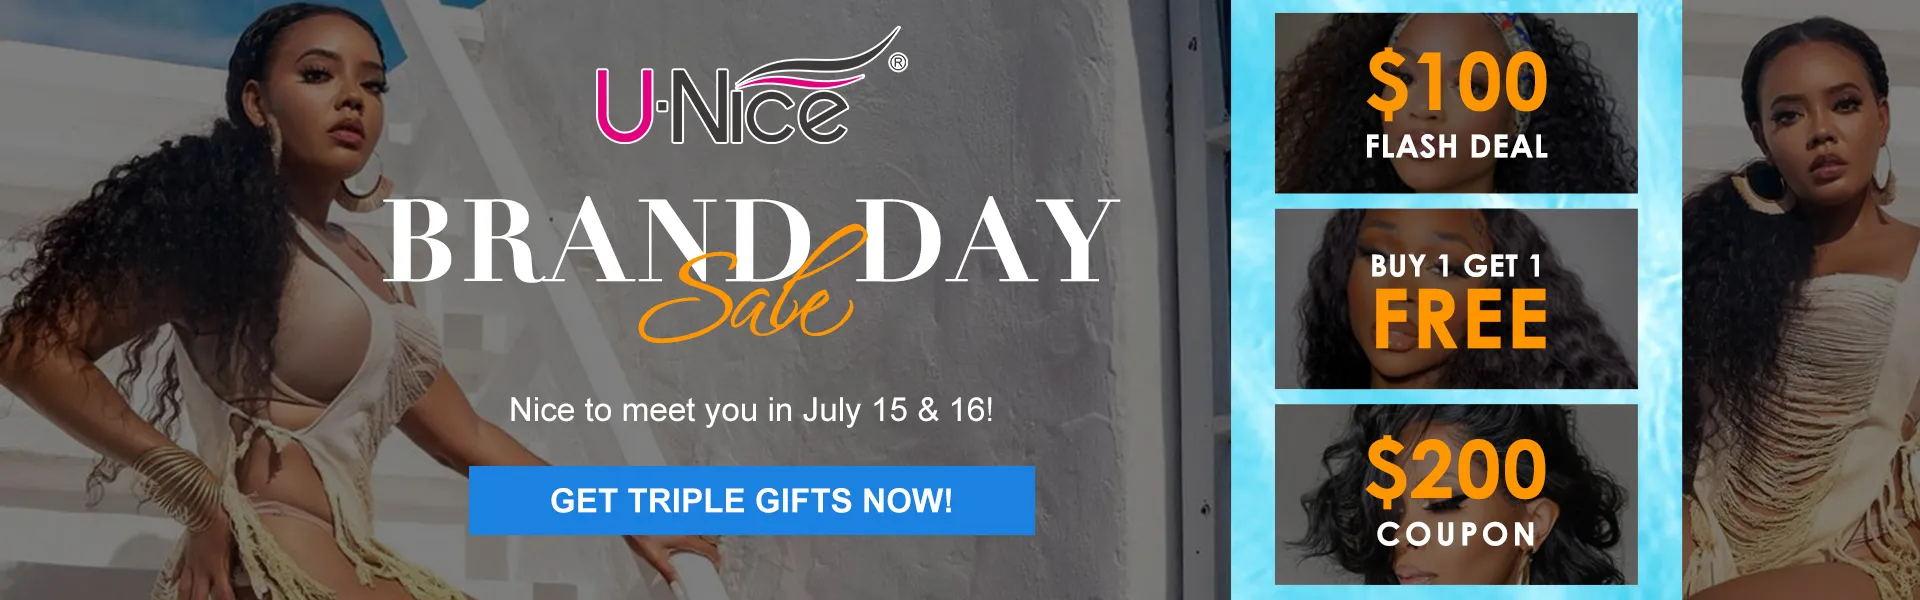 Unice Mall Brand Day